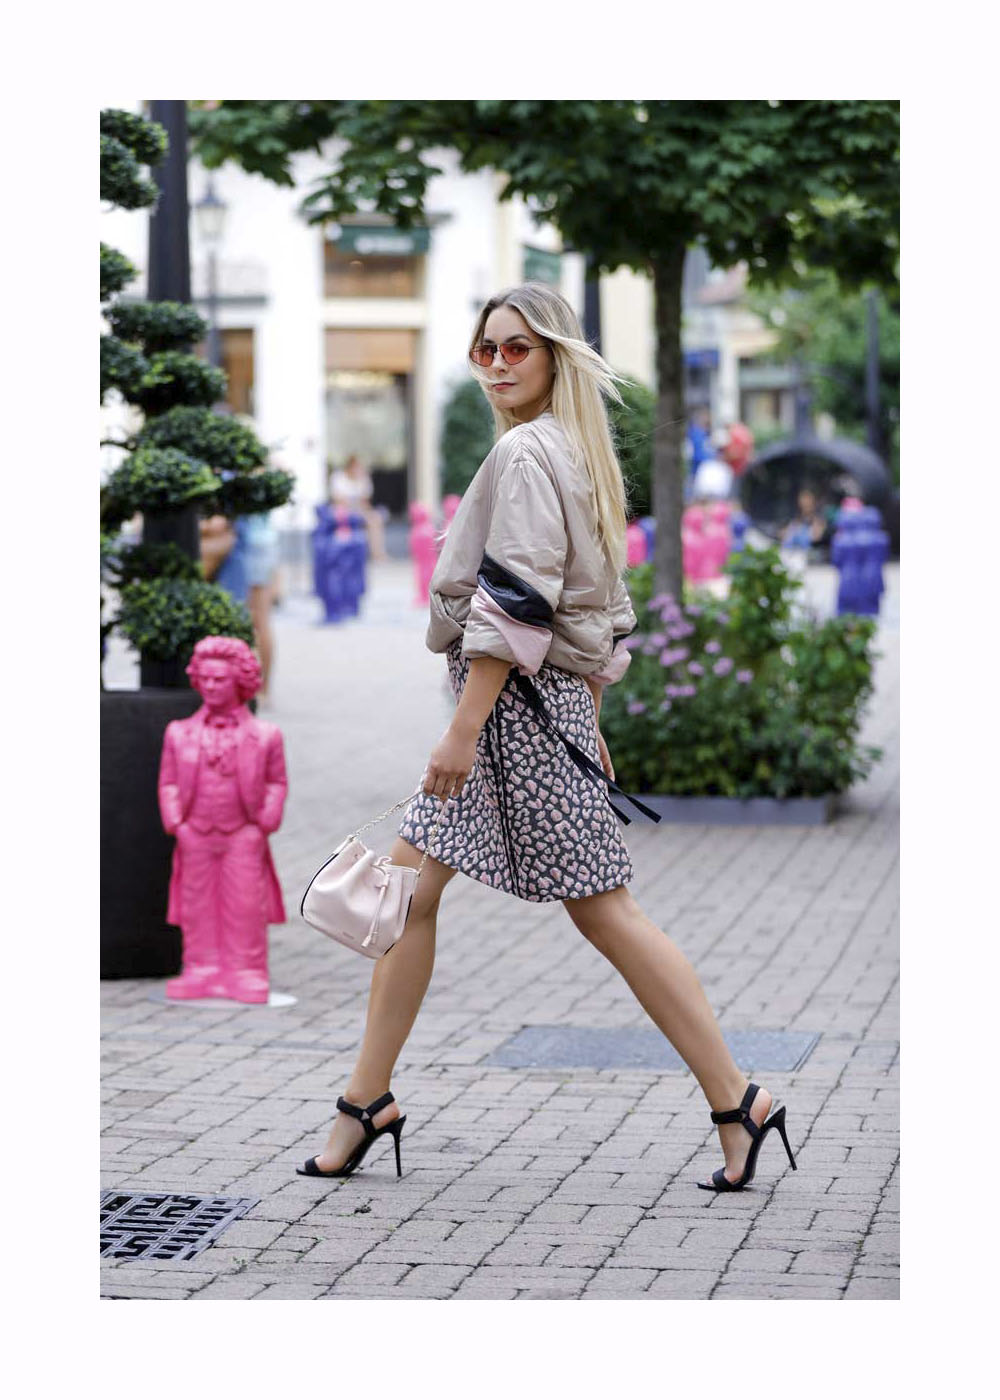 Lara Runarsson Street Style Shooting At Wertheim Village